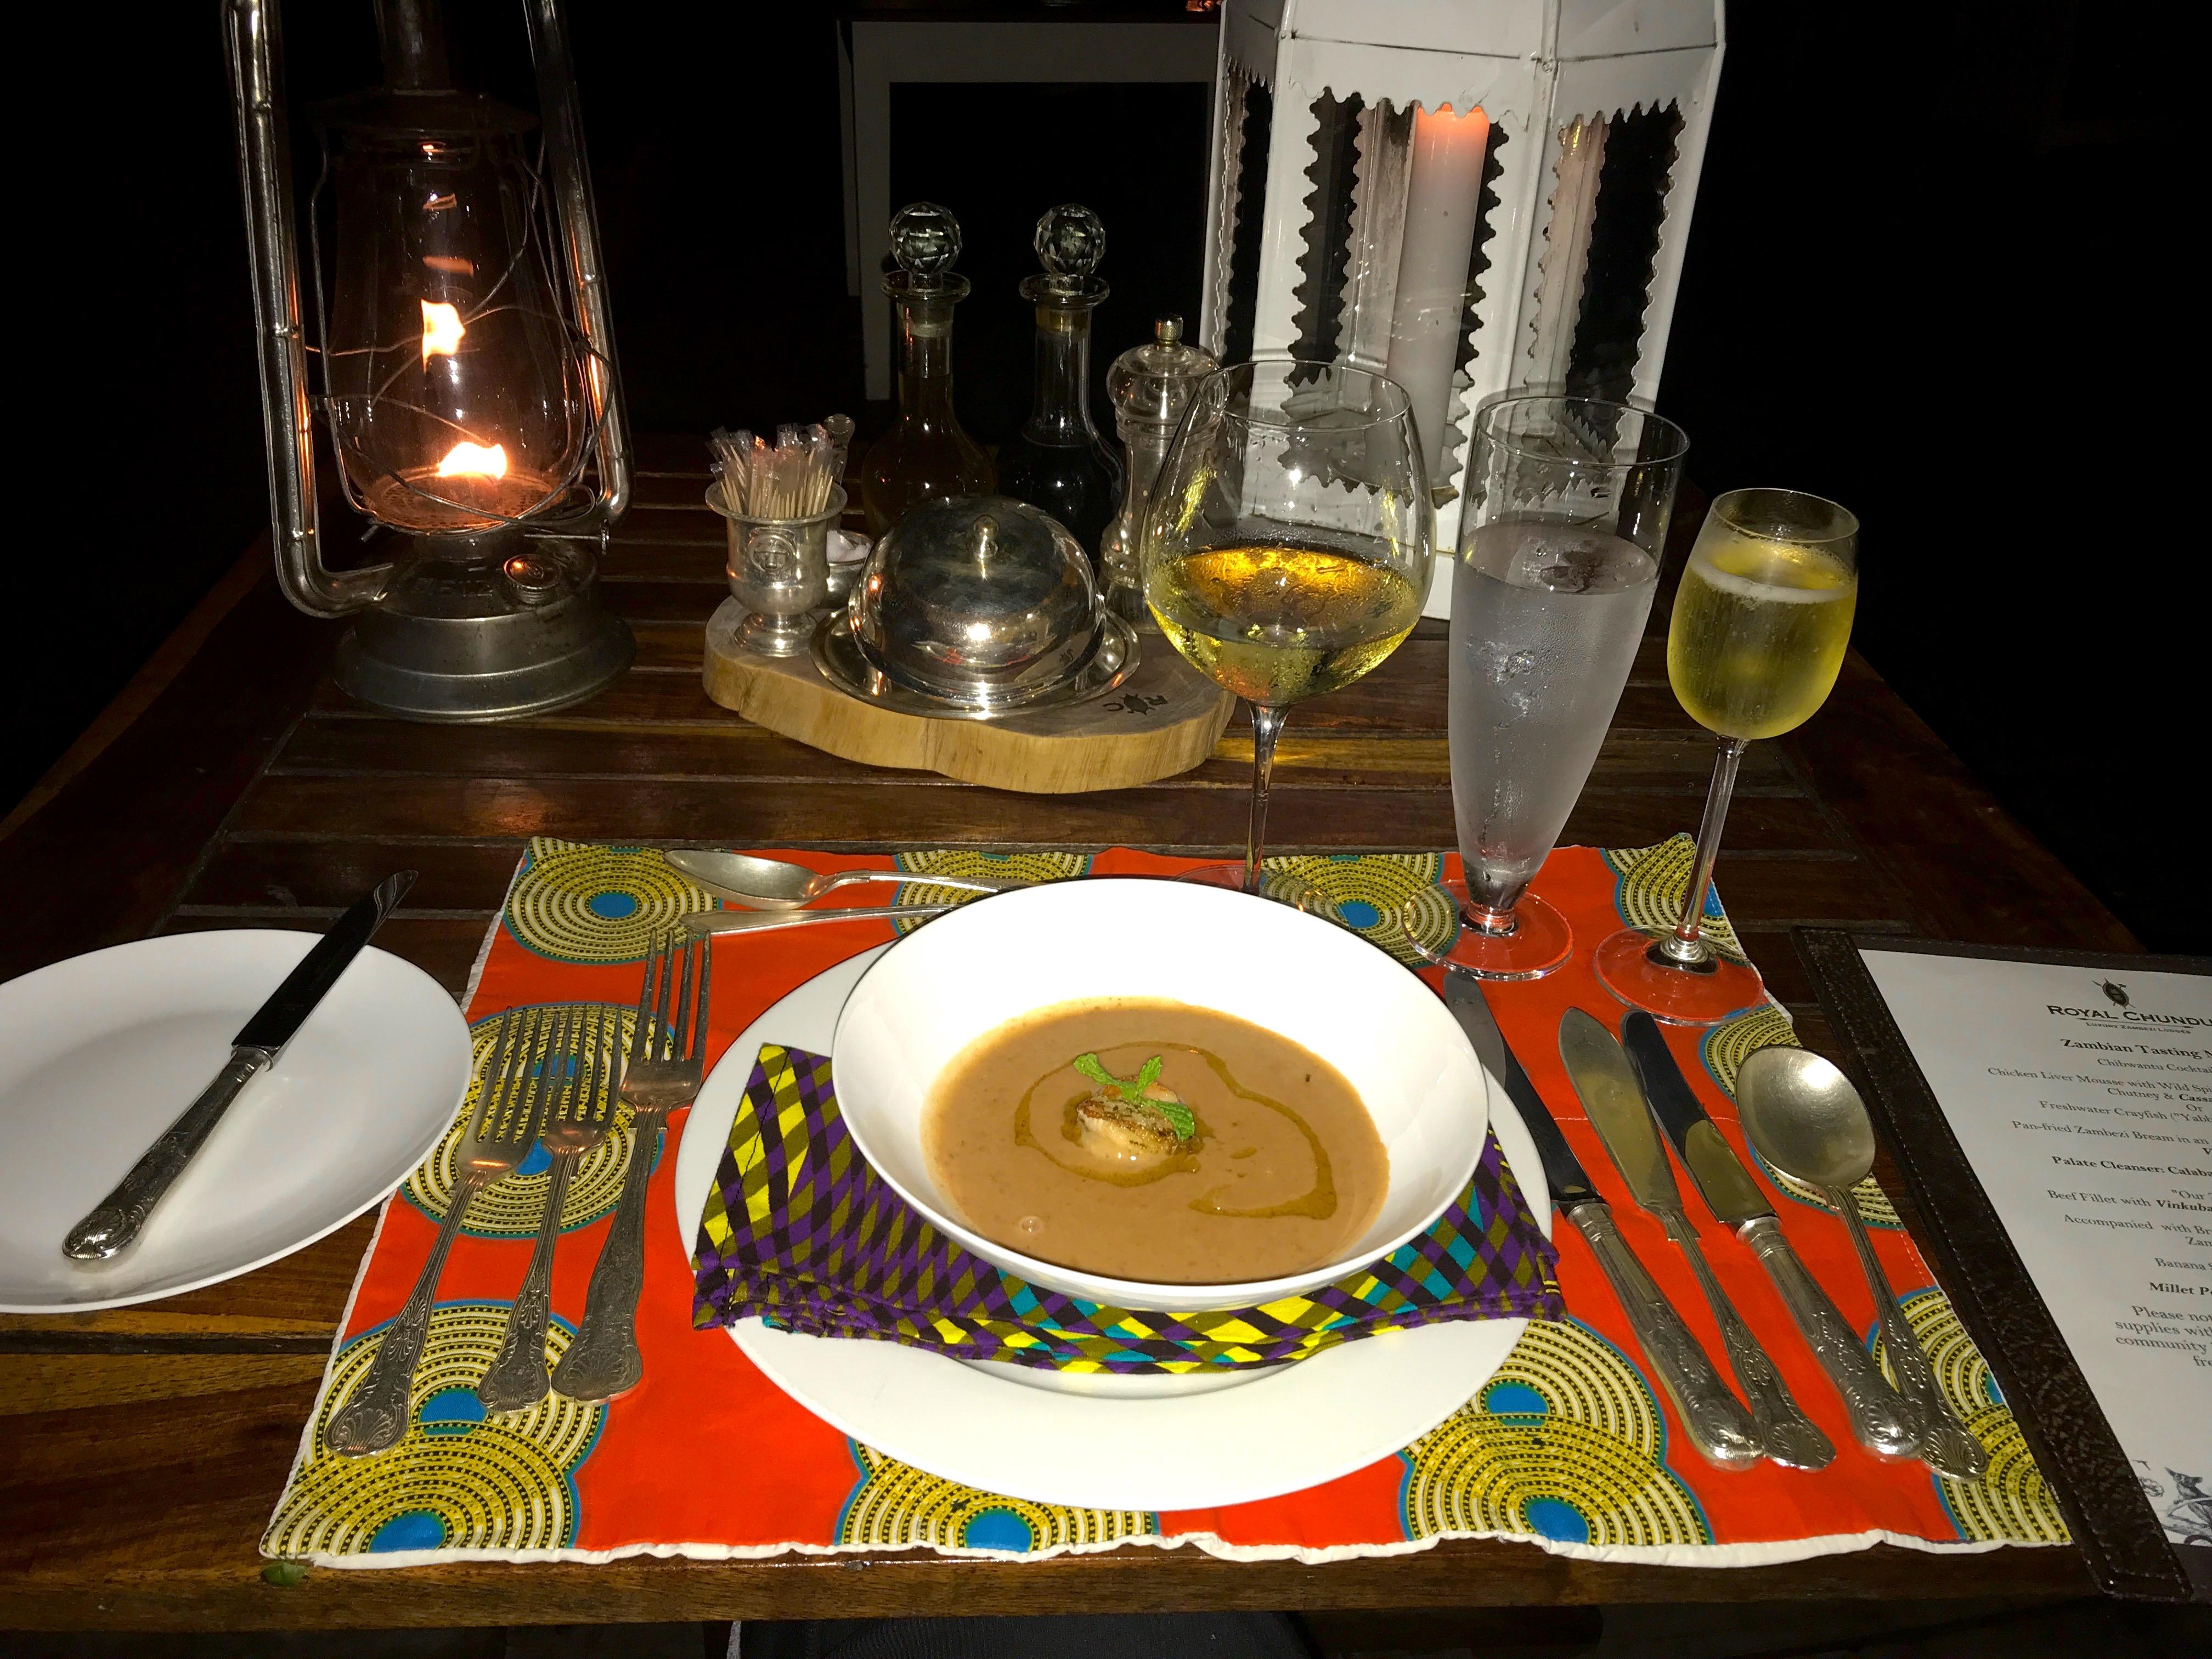 zambian-dinner-royalchundu-lustforthesublime